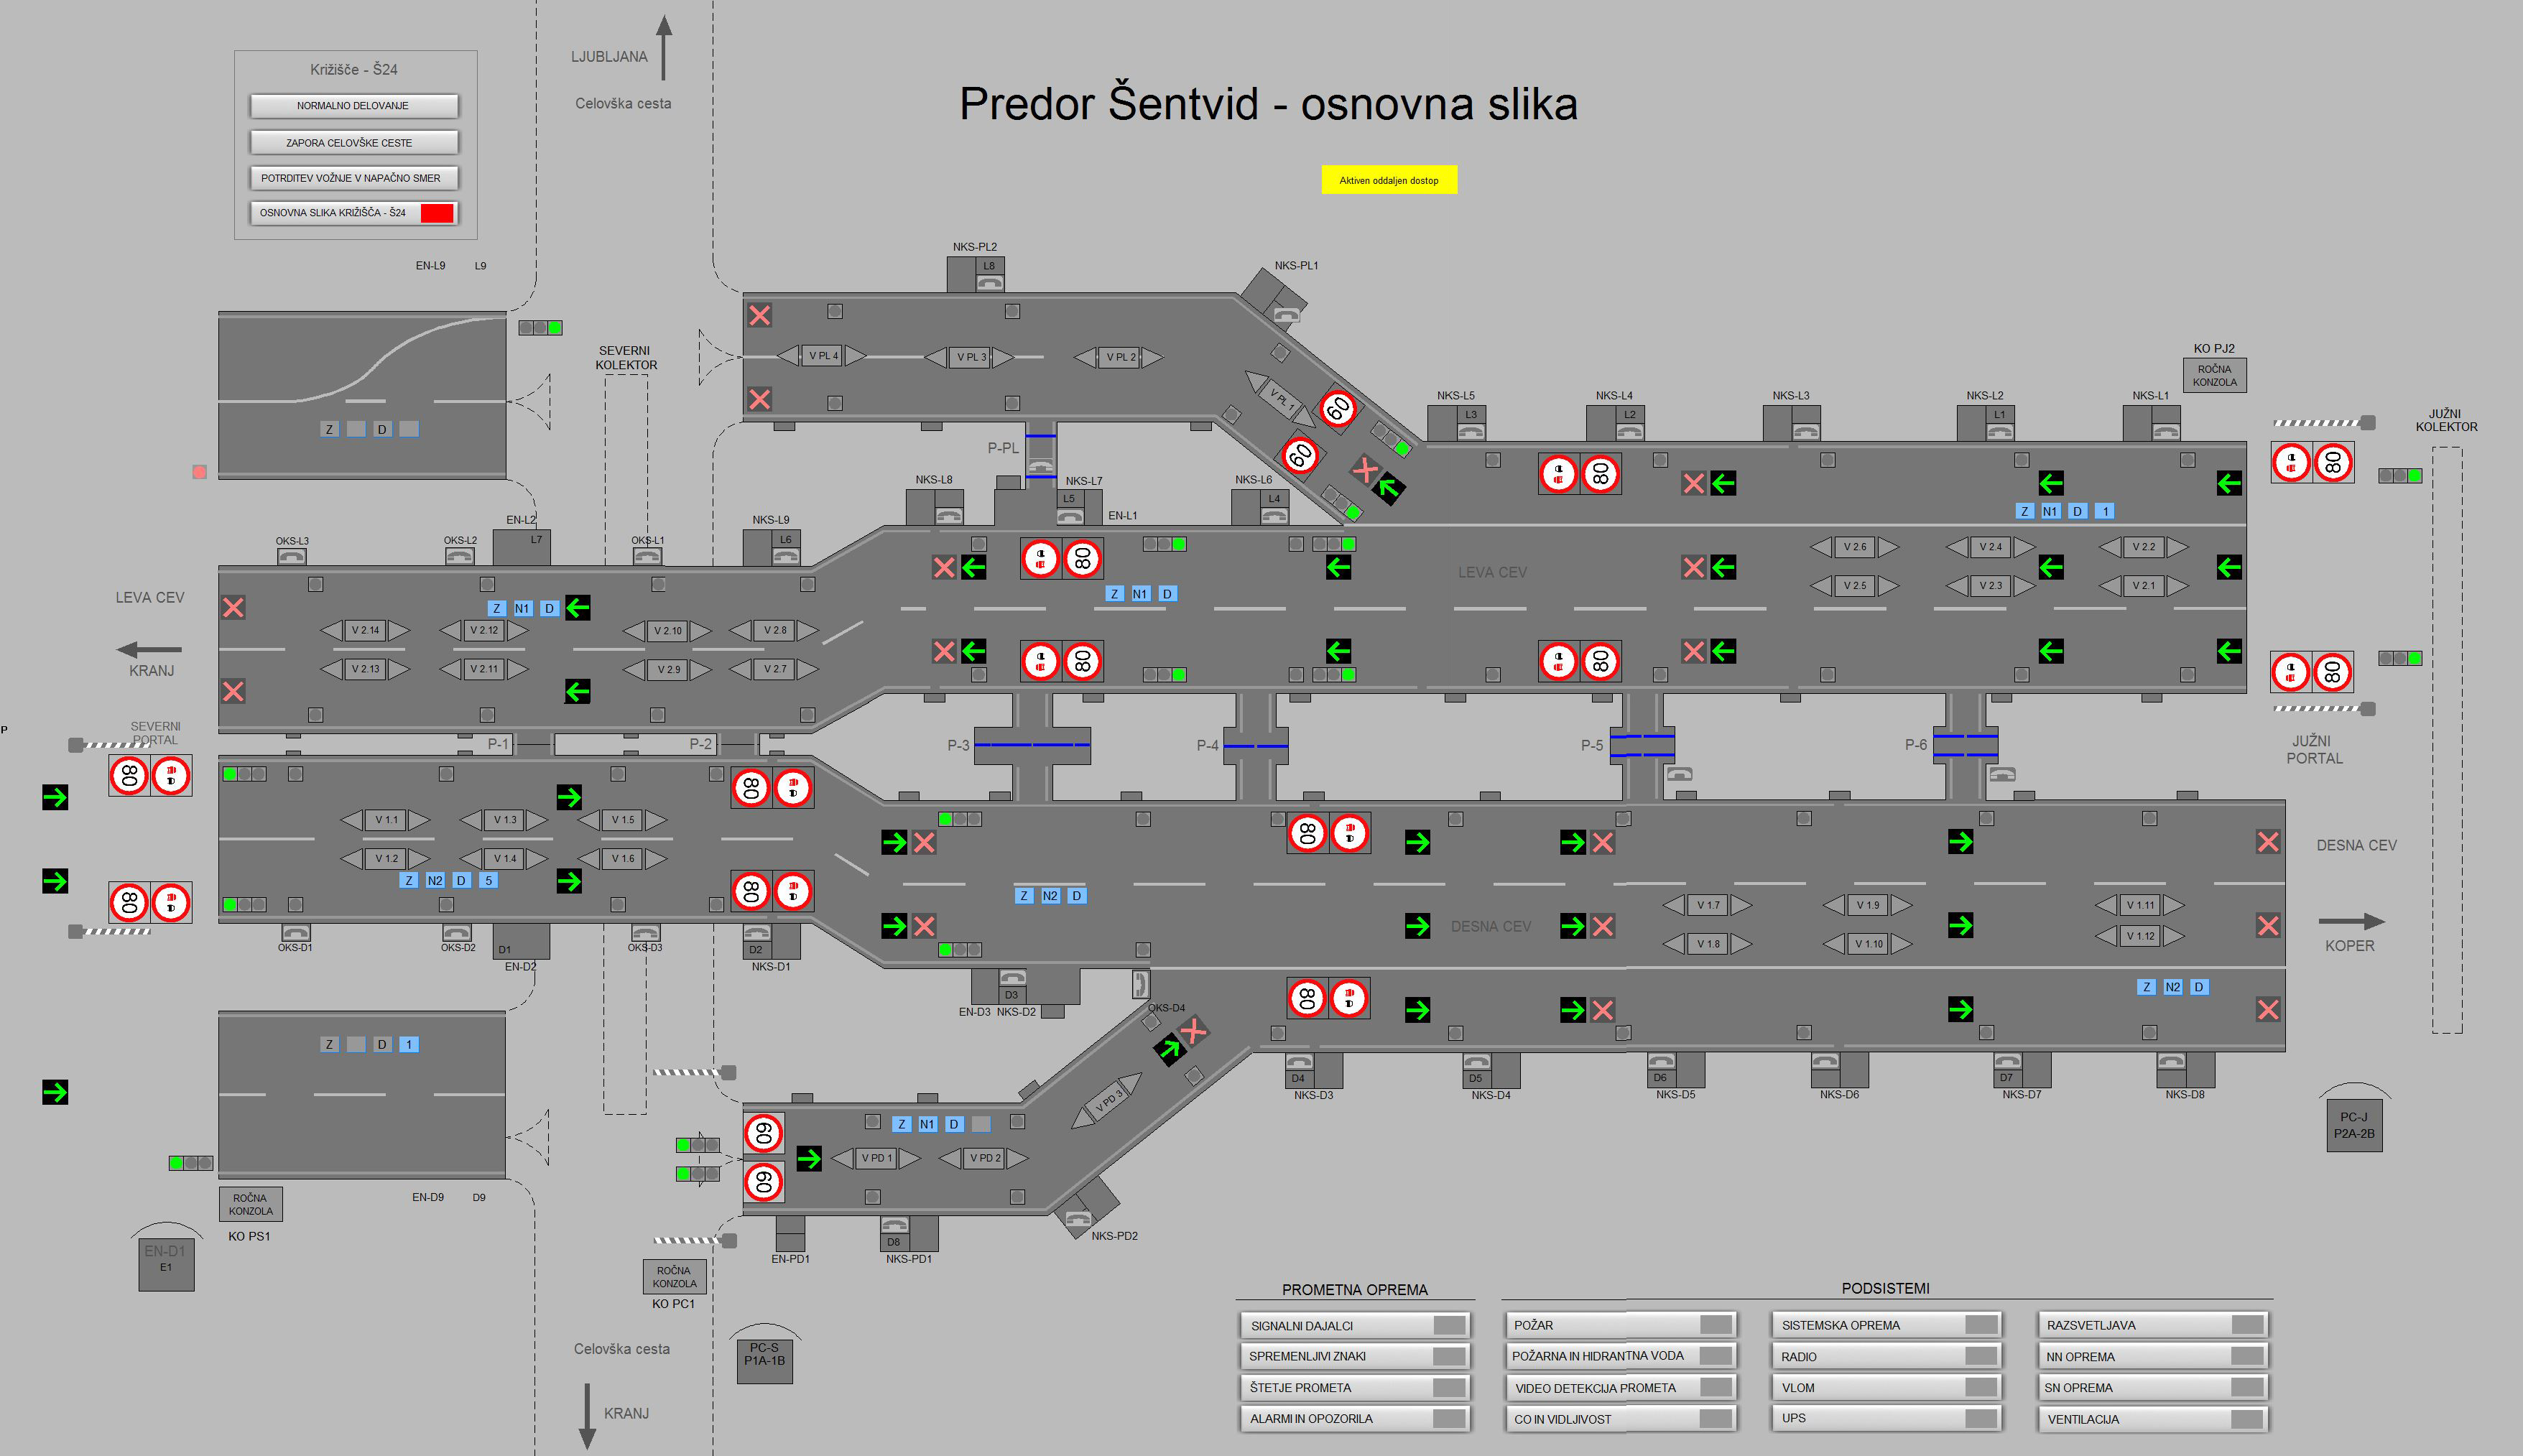 Osnovna slika aplikacije SCADA za upravljanje in nadzor nad opremo predora Šentvid